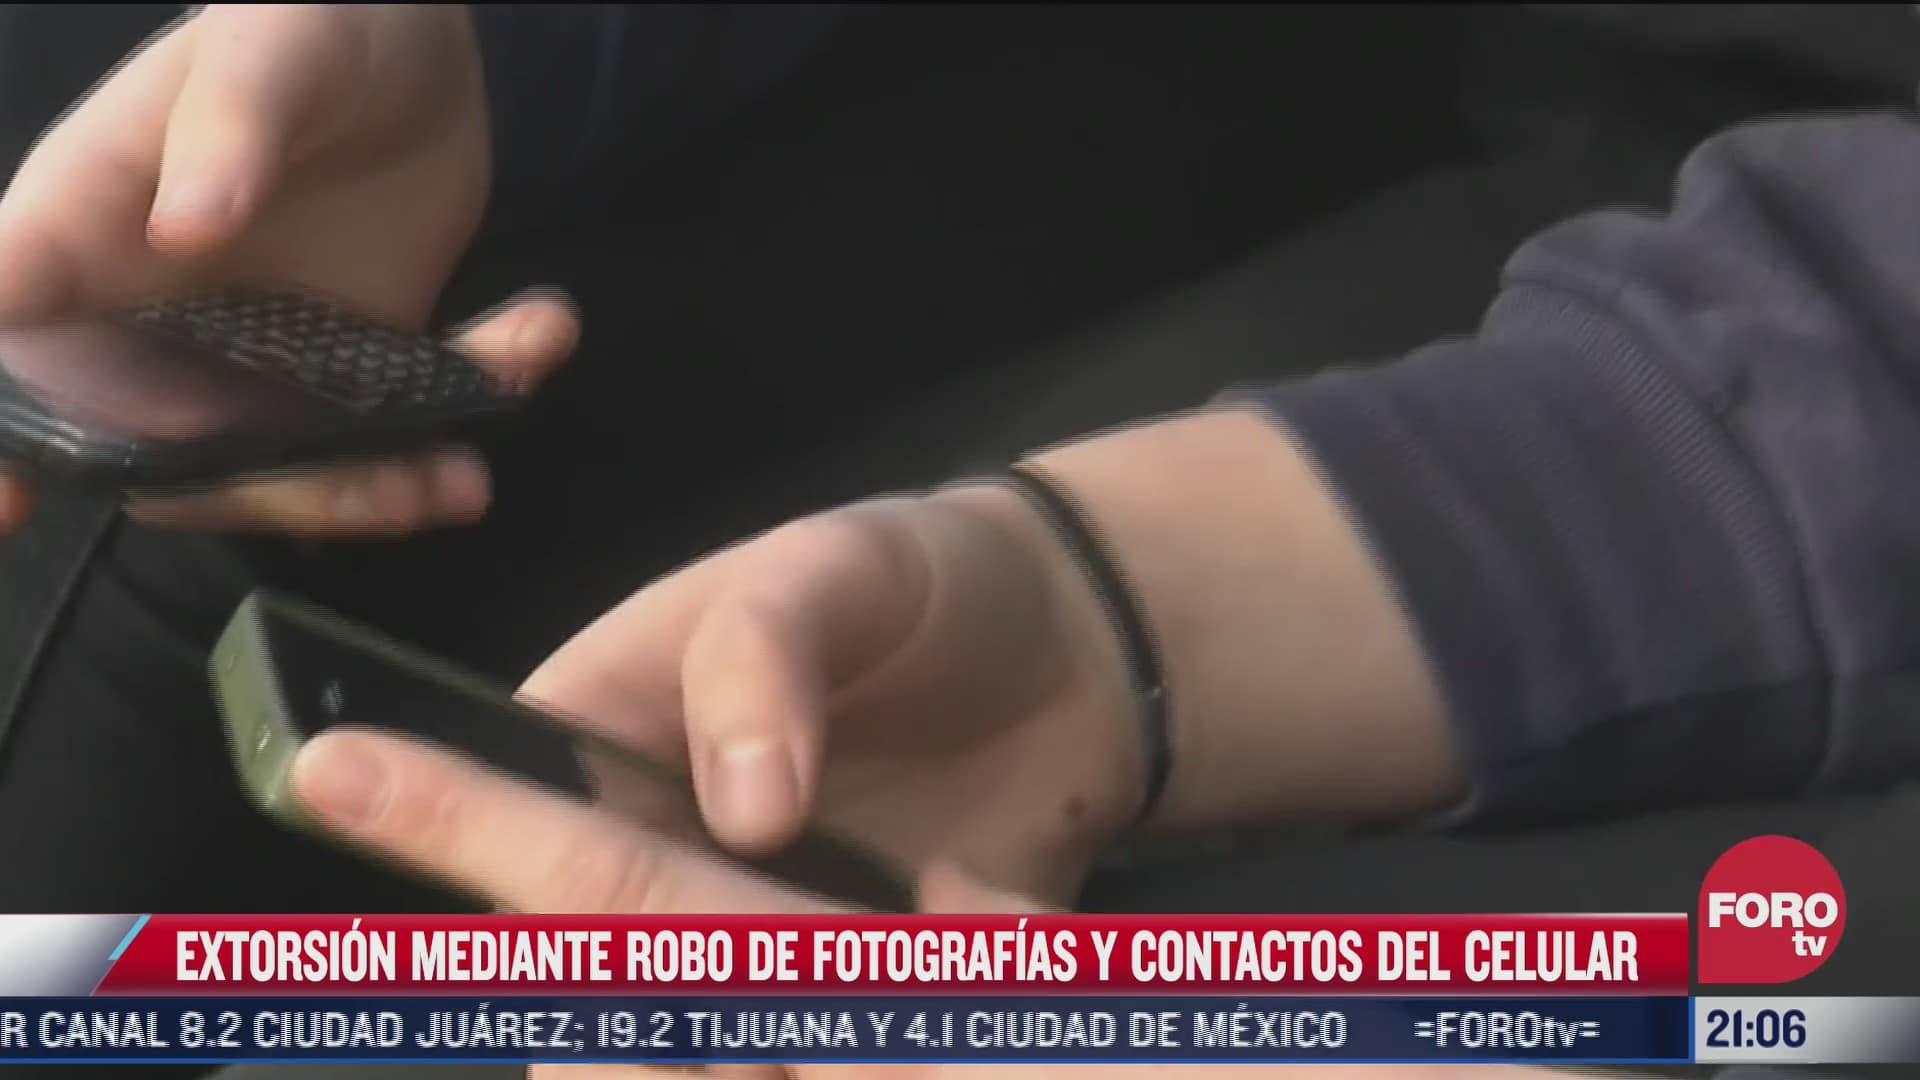 policia cibernetica alerta sobre extorsion mediante robo de fotos en celulares